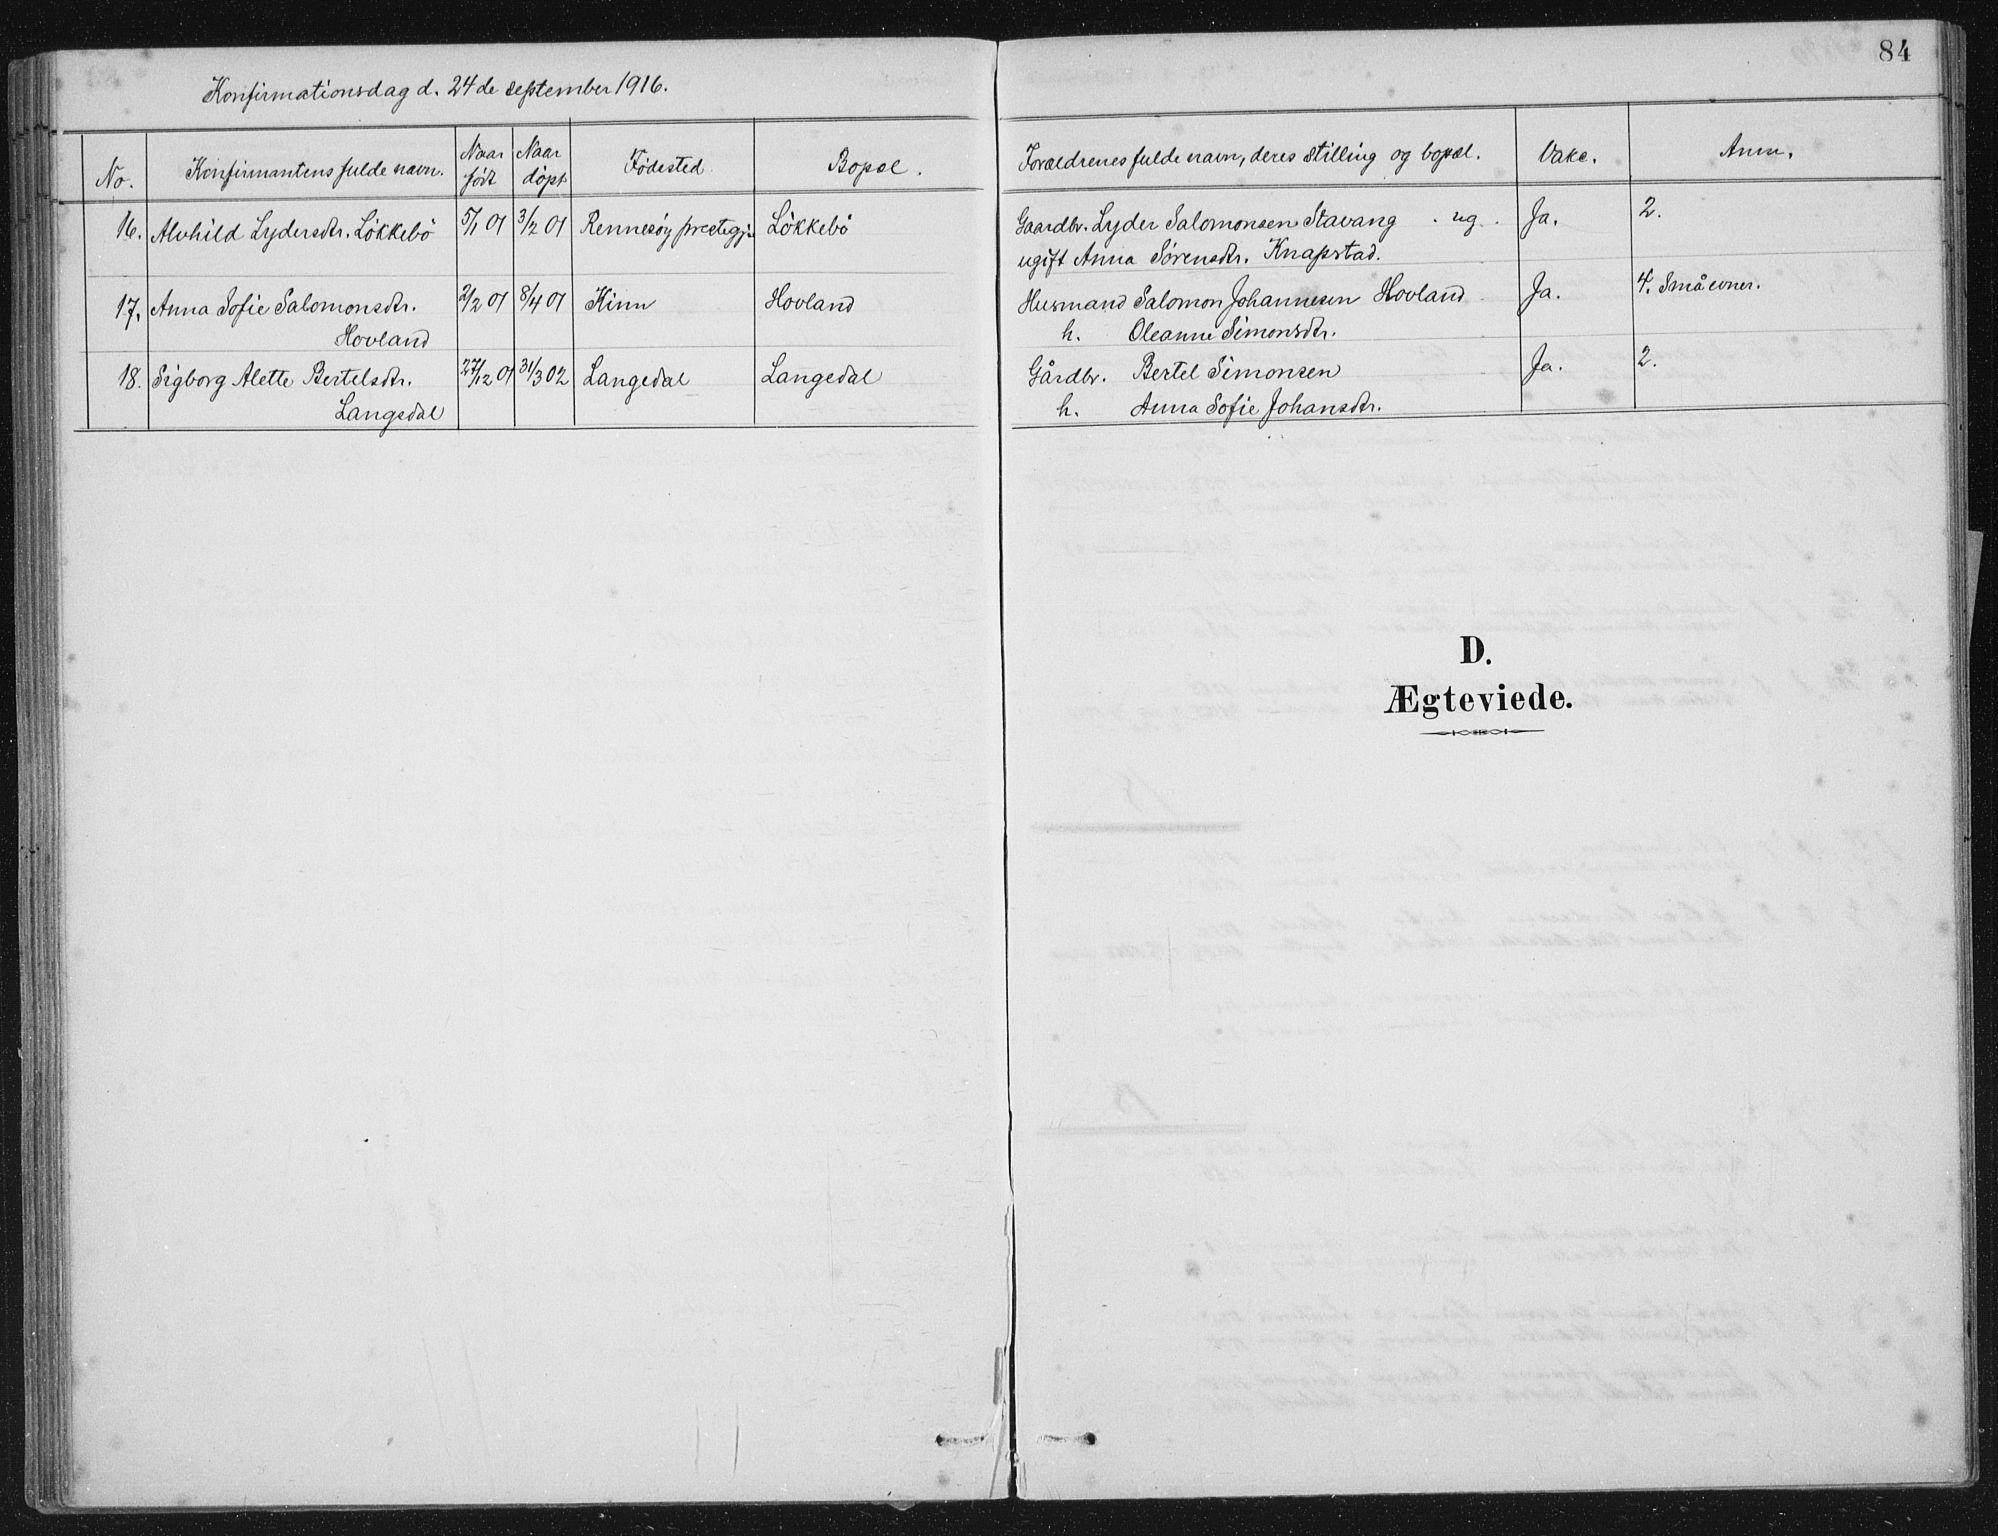 SAB, Kinn sokneprestembete, H/Haa/Haae/L0001: Ministerialbok nr. E 1, 1890-1916, s. 84